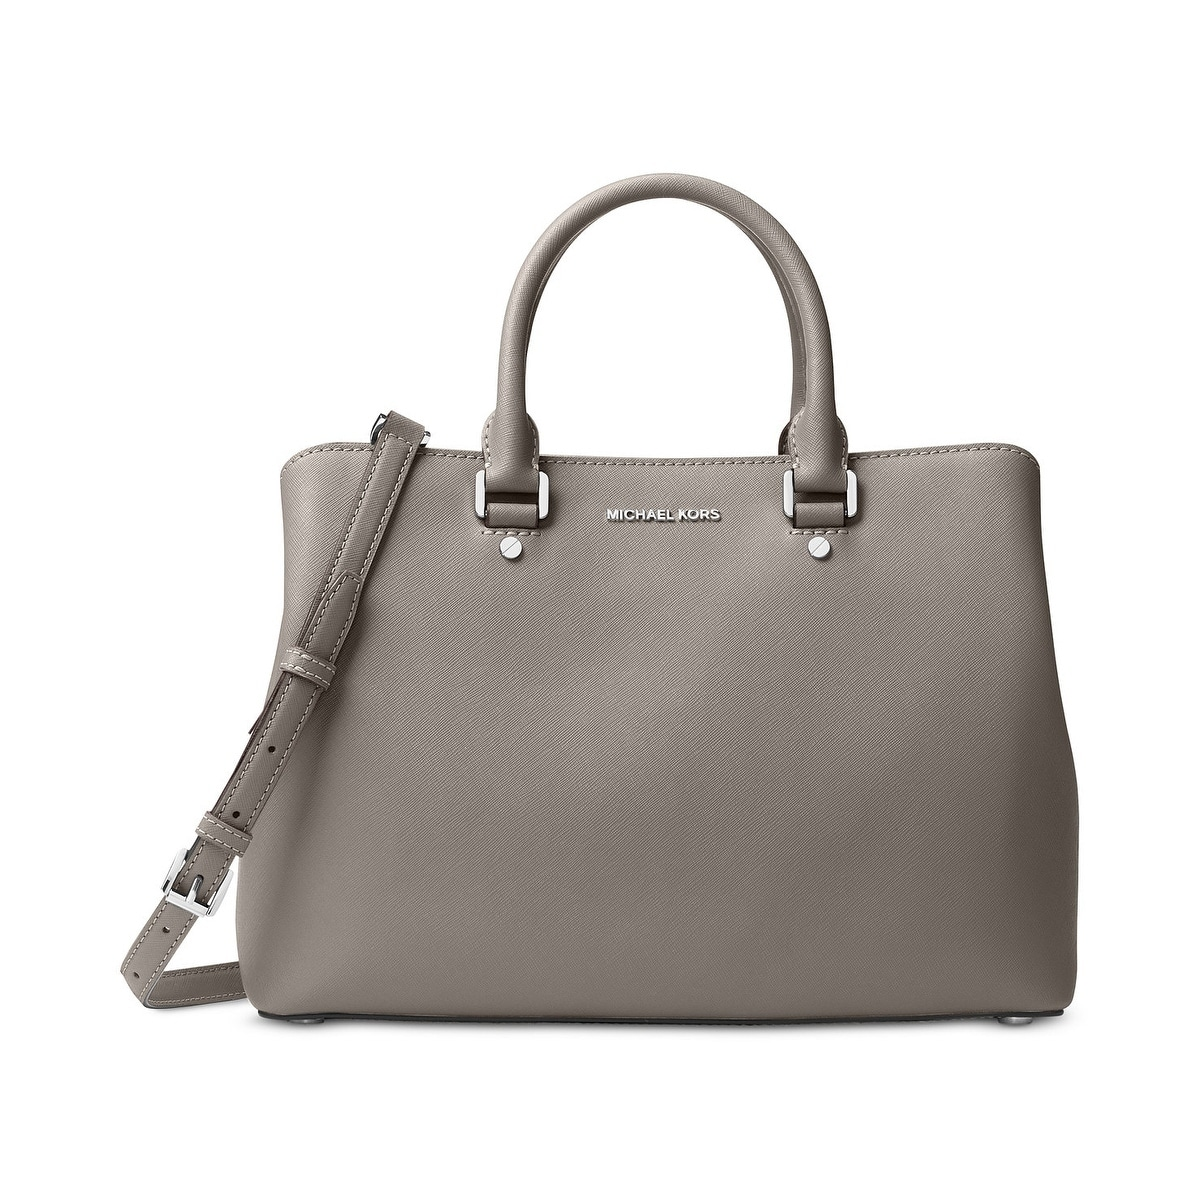 b6ae73ee07c06 Hamilton ... Shop Michael Kors Savannah Large Pearl Grey Satchel Bag - Free  Shipping Today - Overstock.